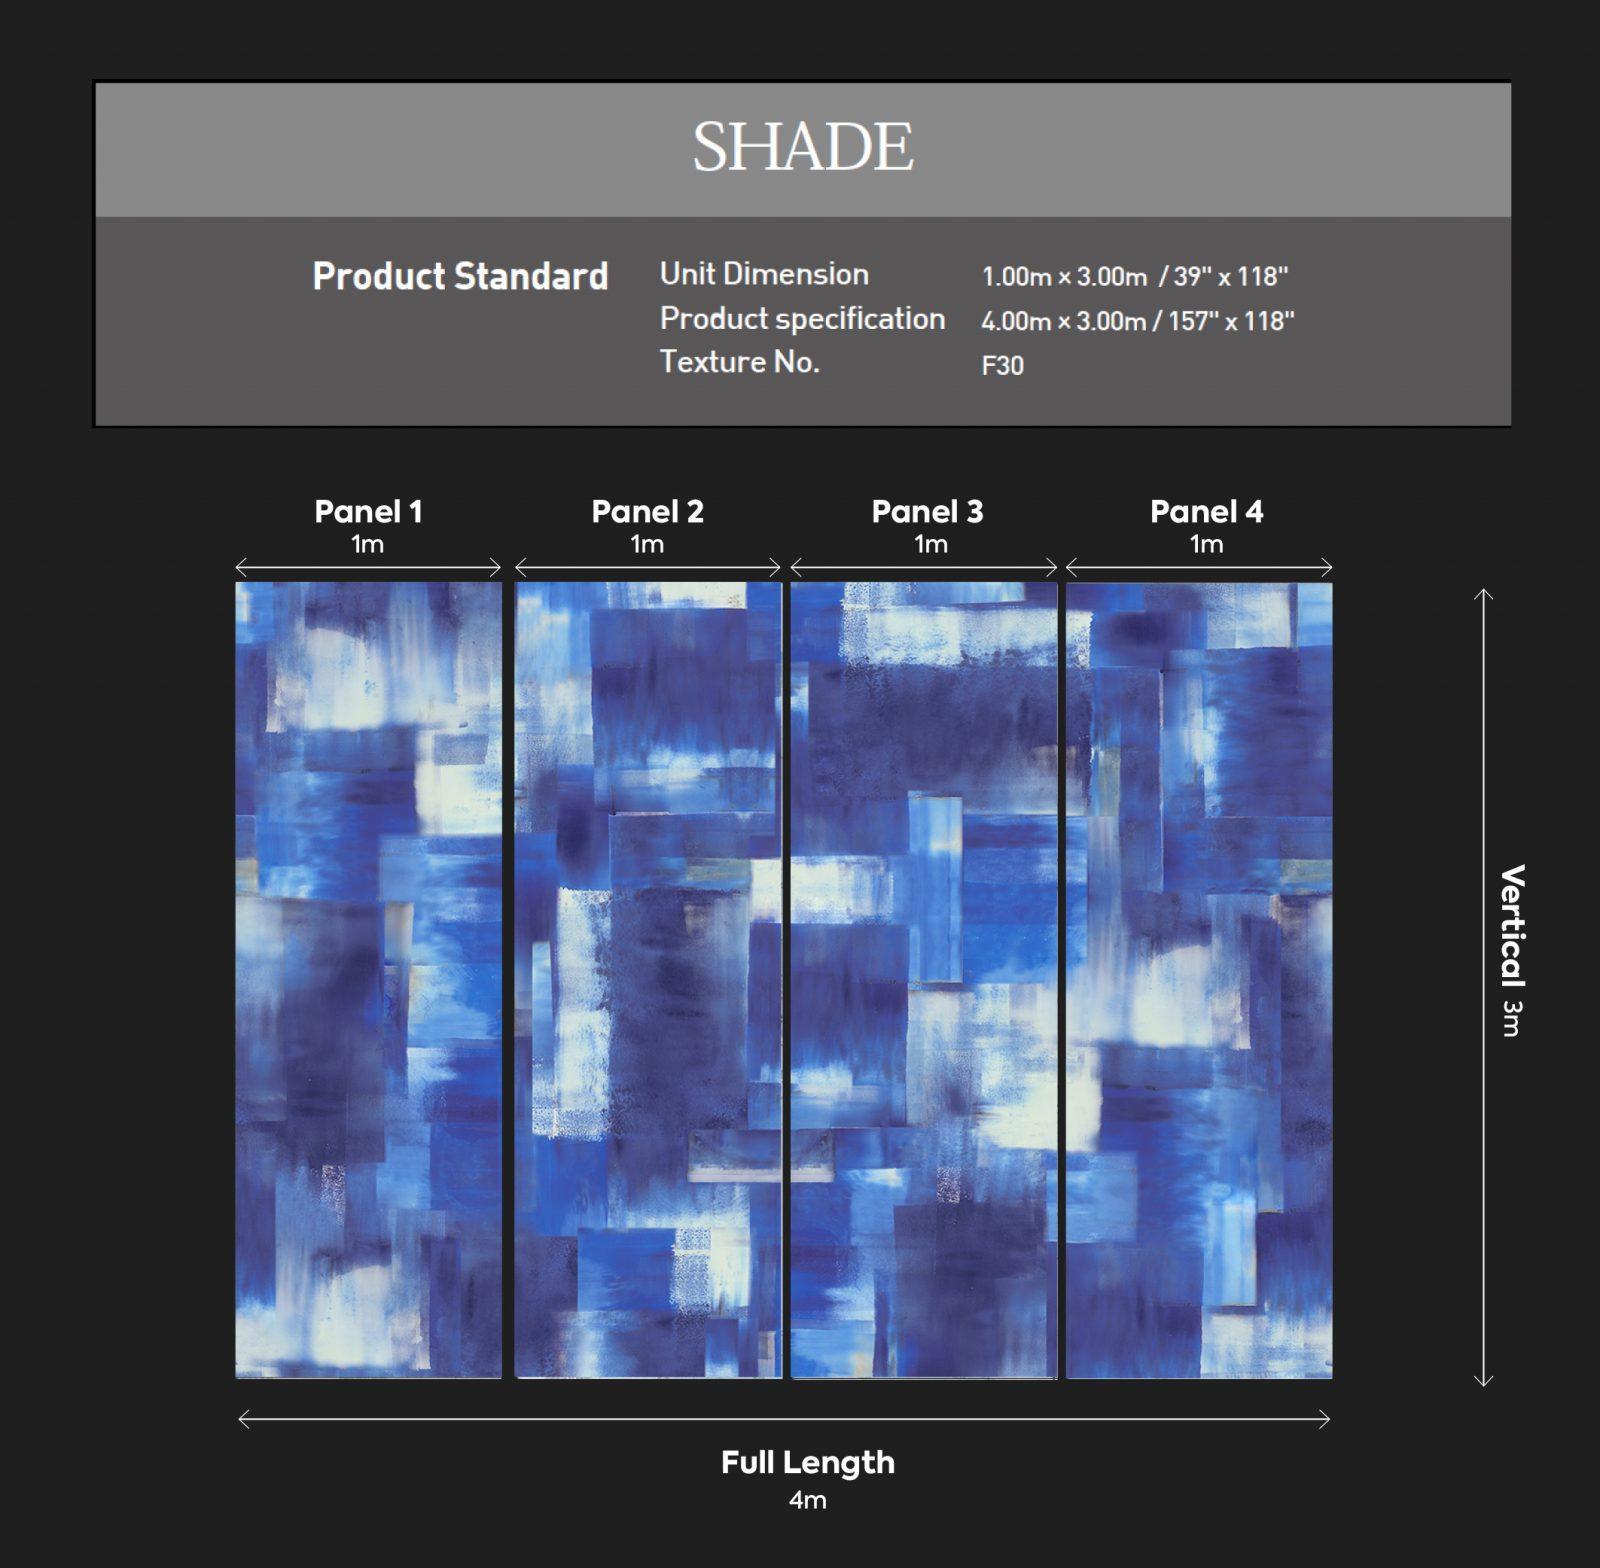 Shade Dimensions